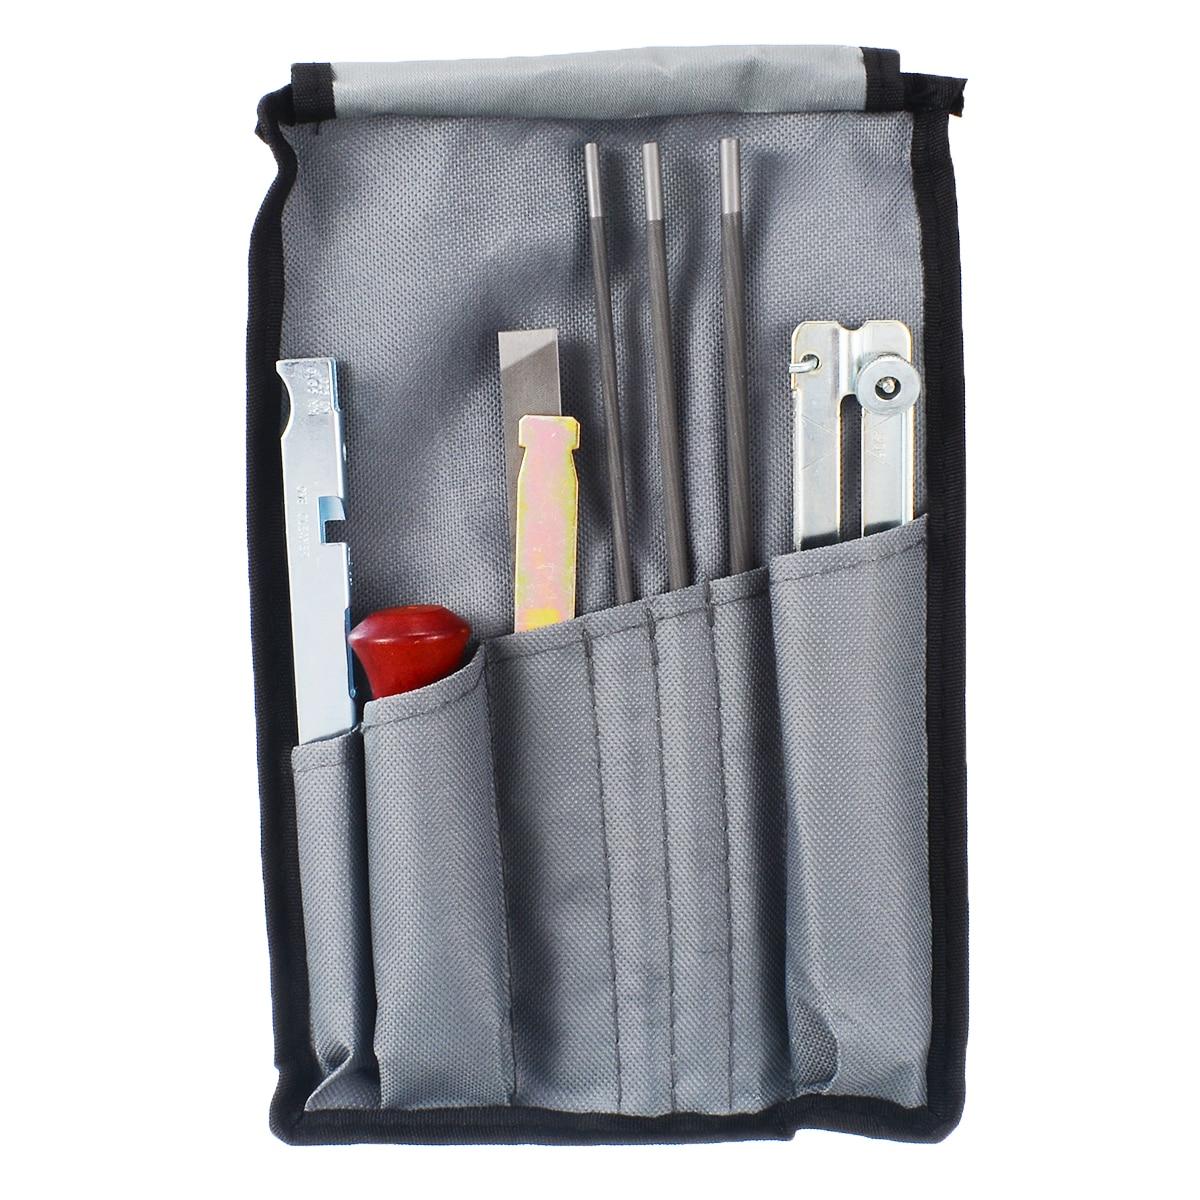 8pcs Chain Saw Sharpening Kit Guide Bar File Instruction Chainsaw Sharpening Hand Tool Set Mayitr